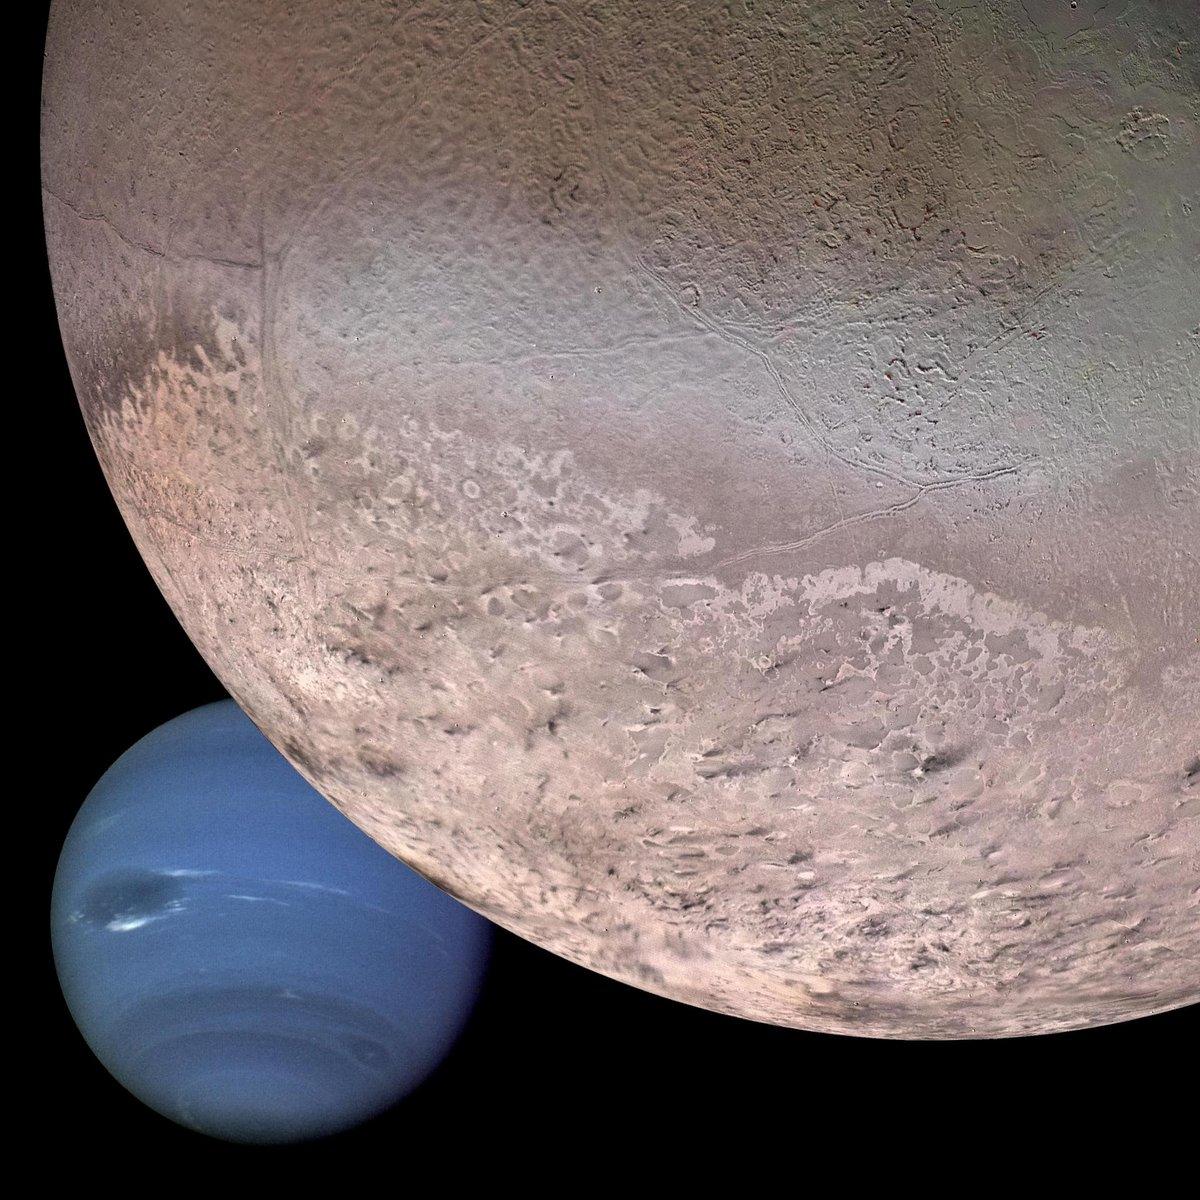 Montage Neptune Triton composite Voyager 2 © NASA/JPL-Caltech